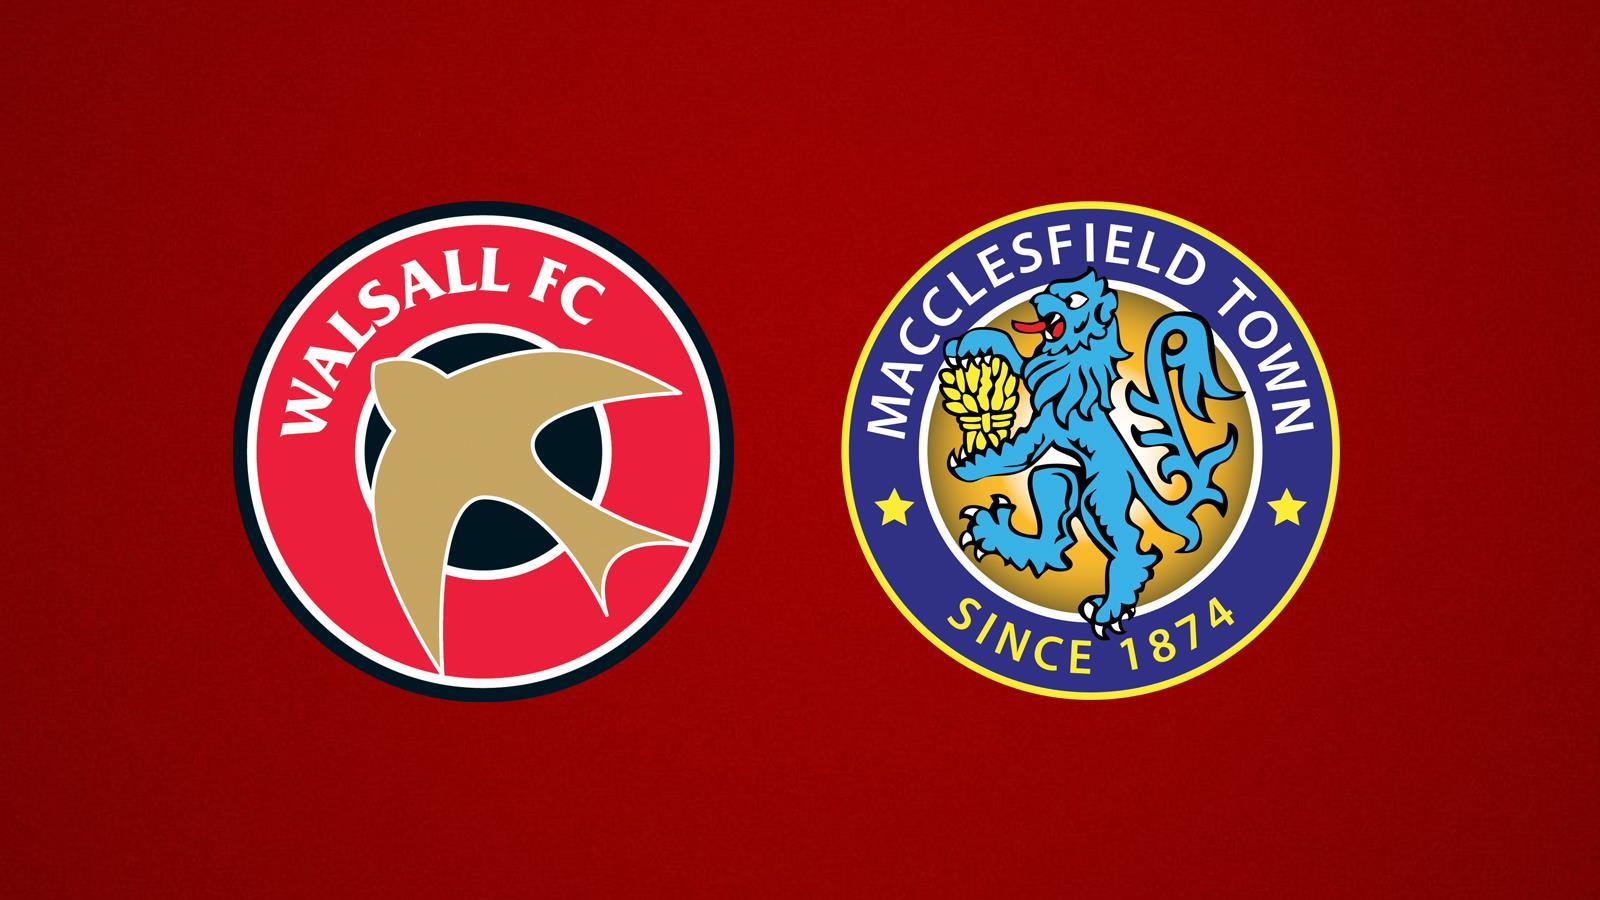 Poll: Walsall v Macclesfield Town